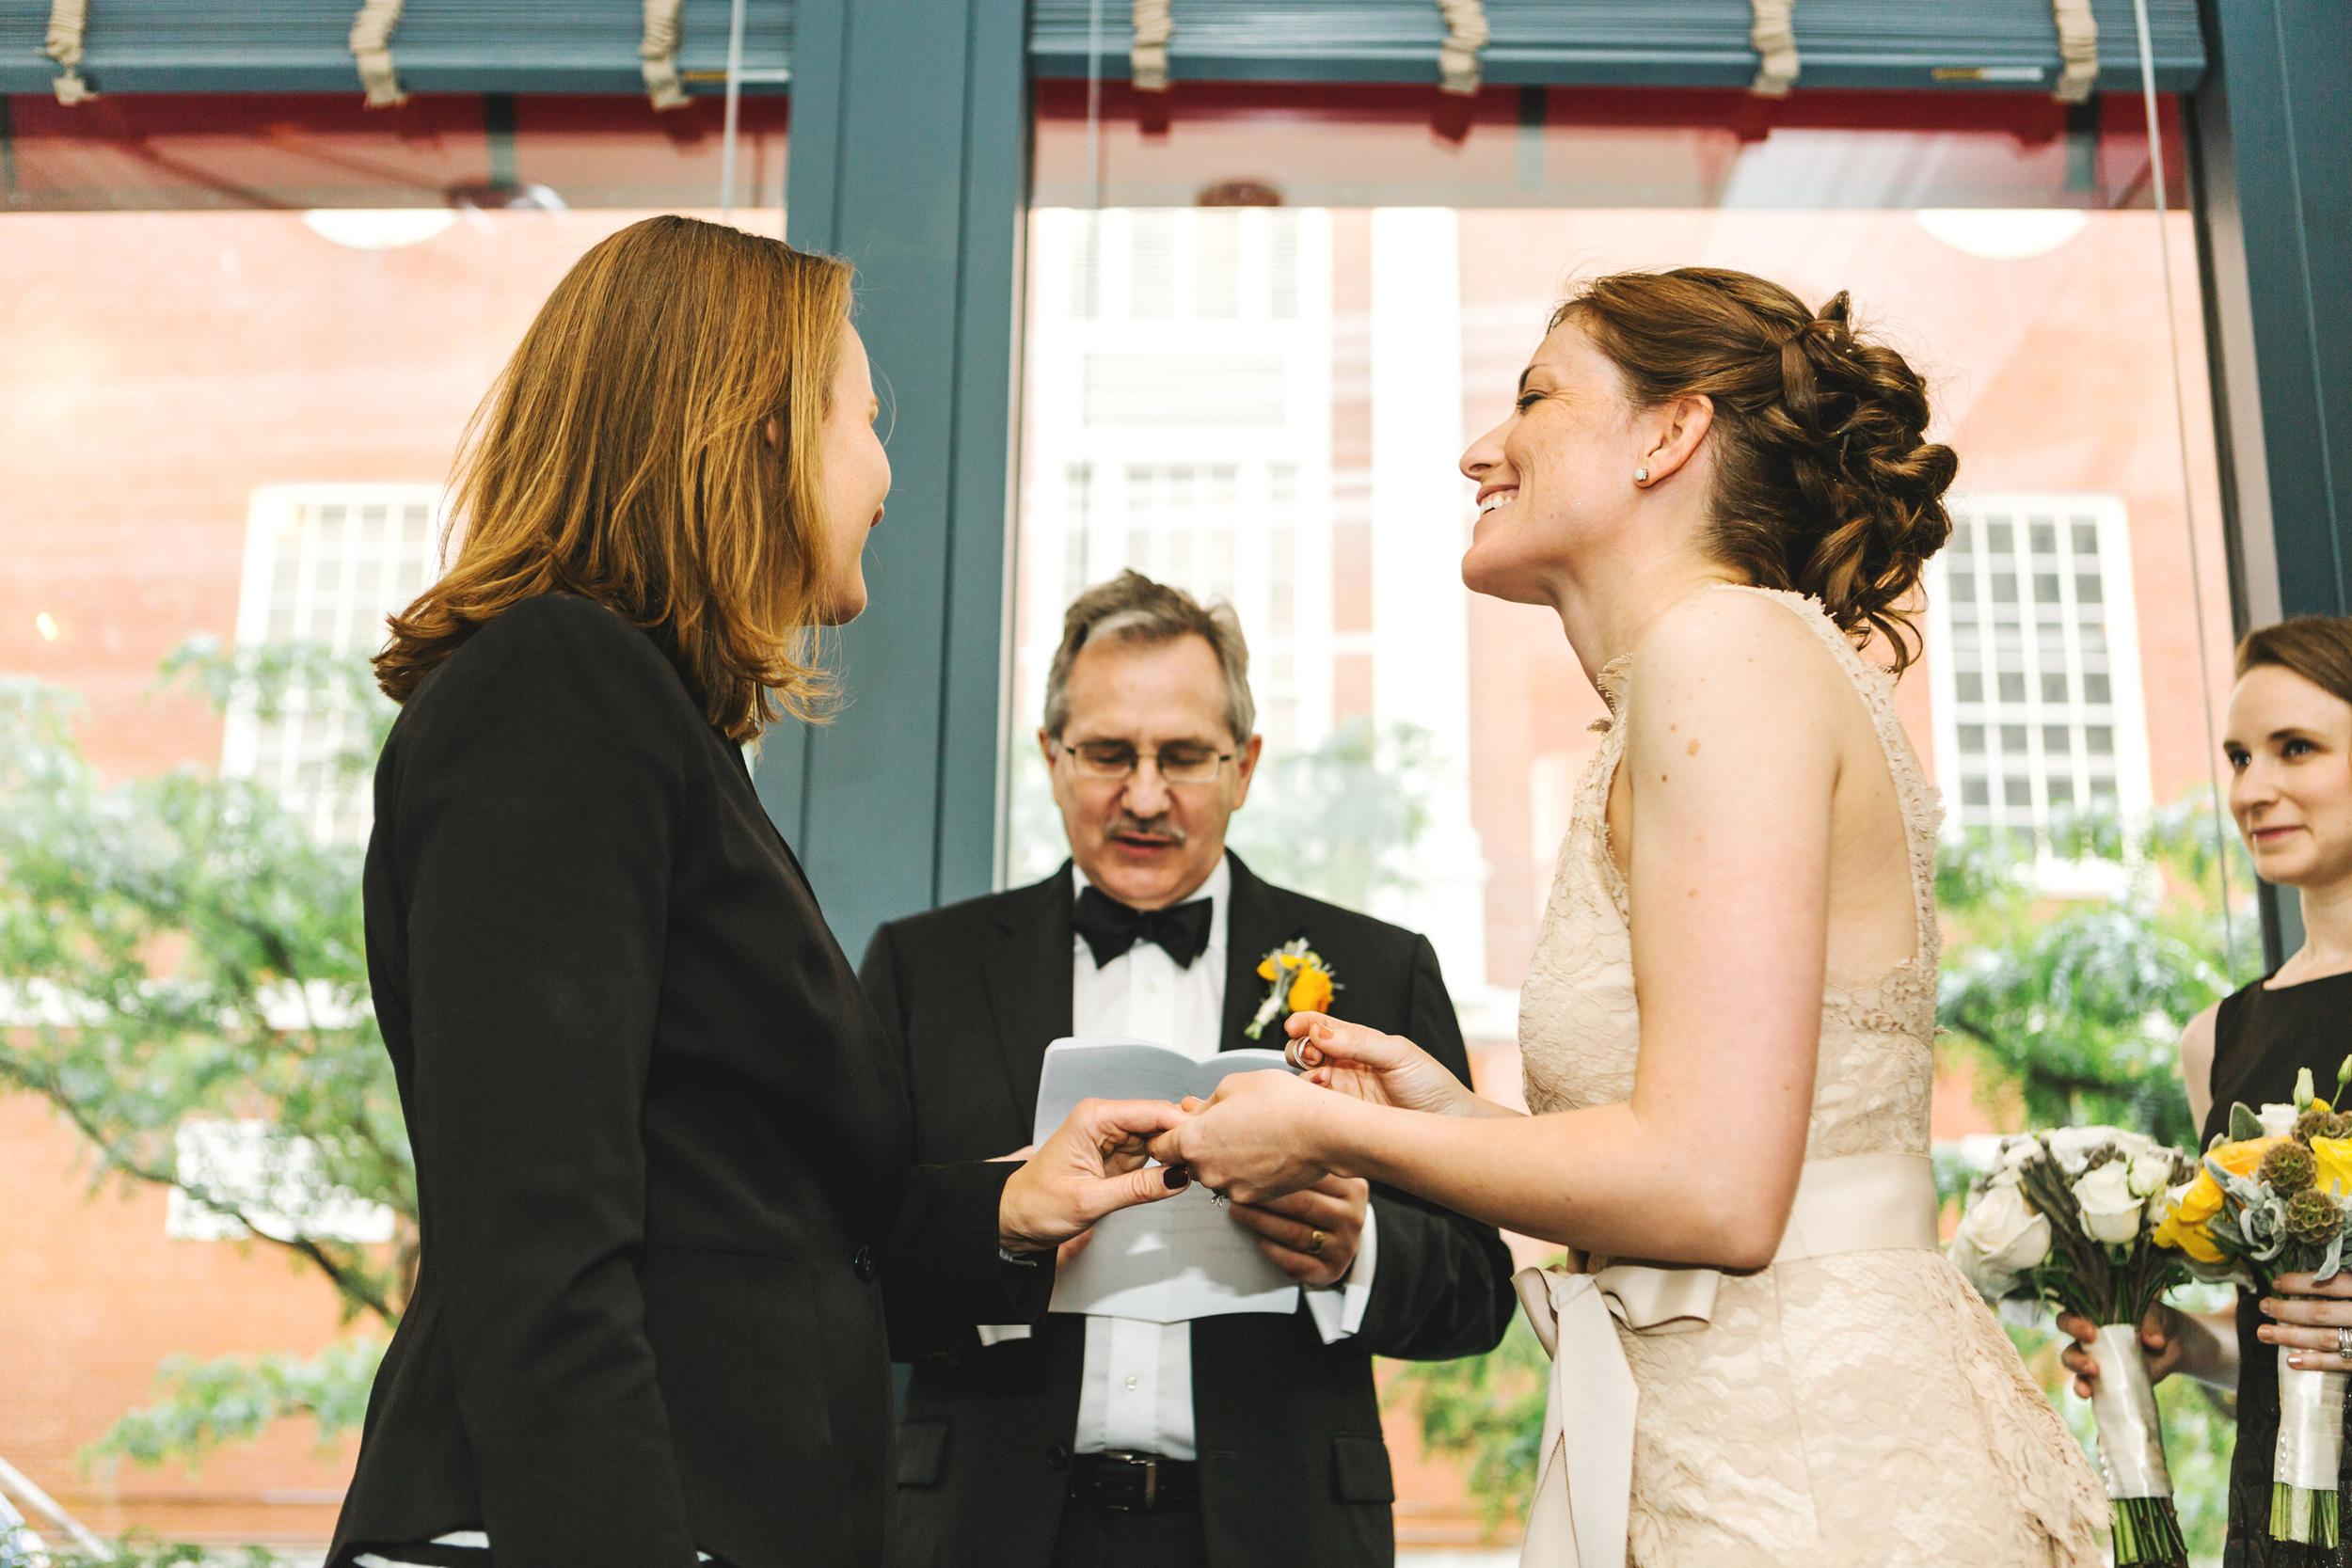 Boston_Wedding_Photographer_Lena_Mirisola-53.jpg